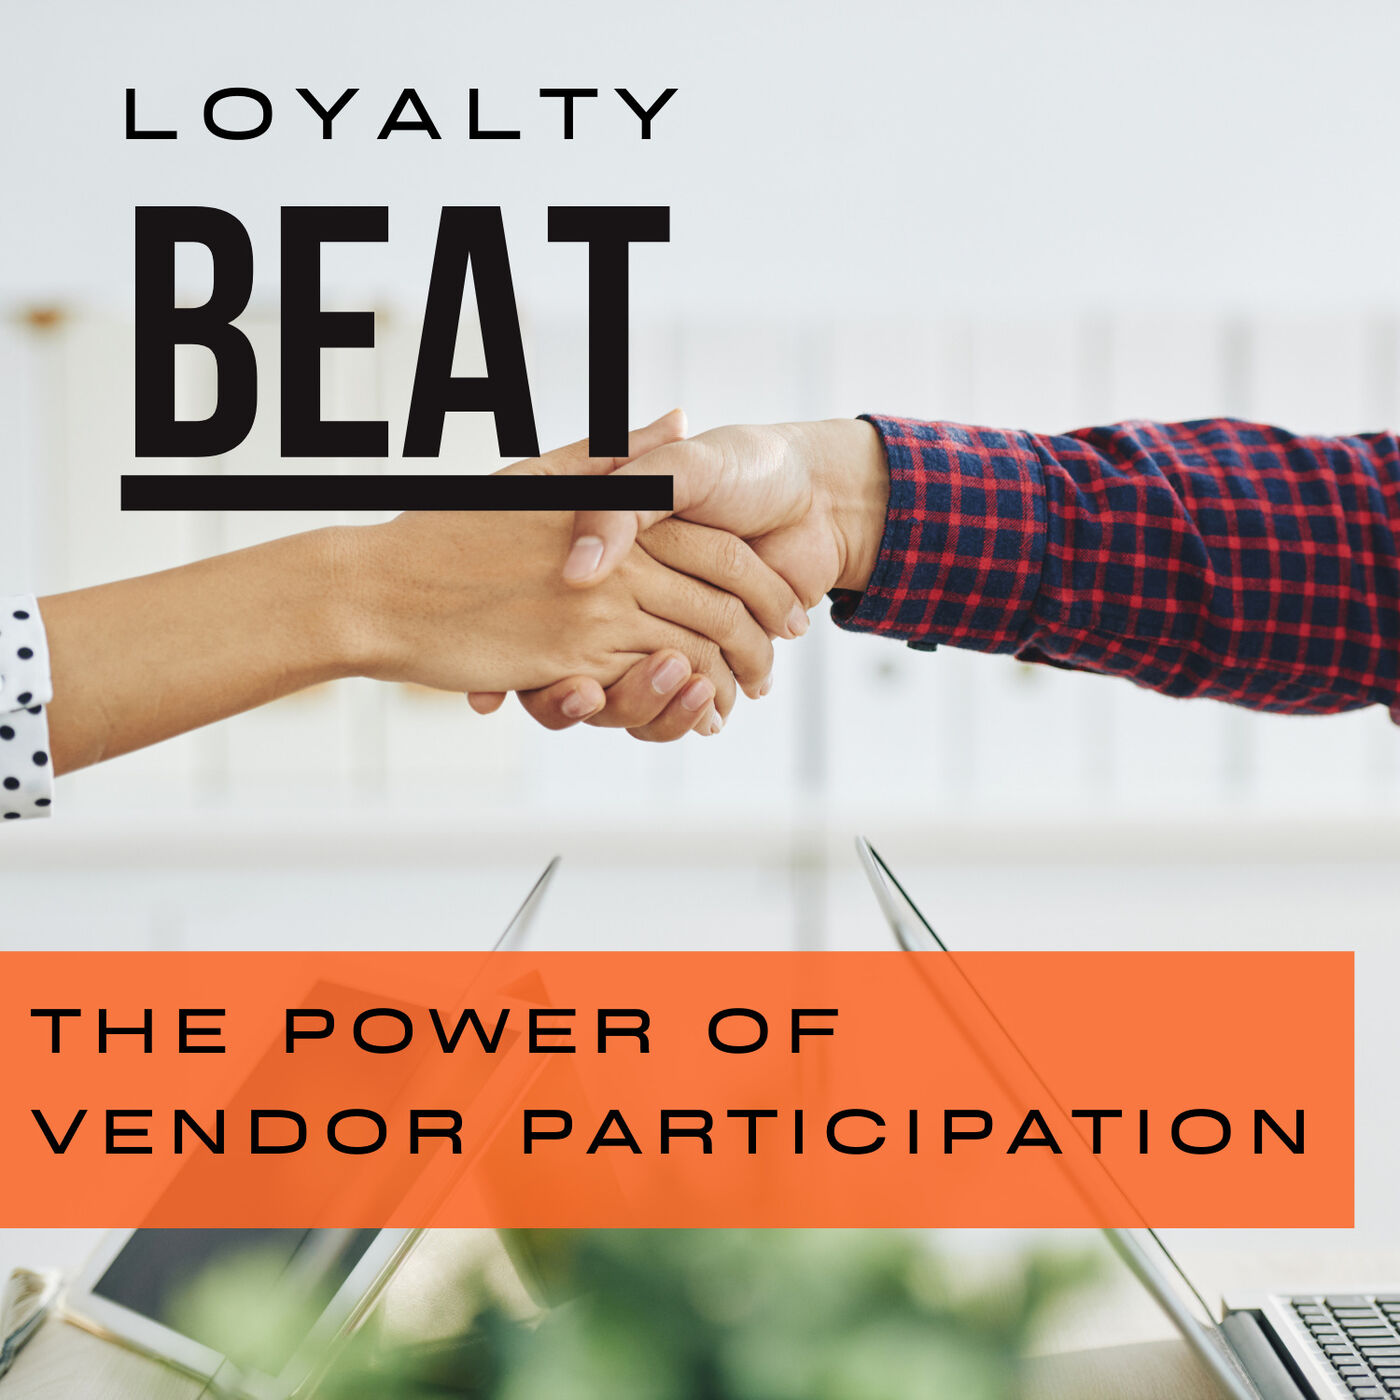 Episode 5: The Power of Vendor Participation